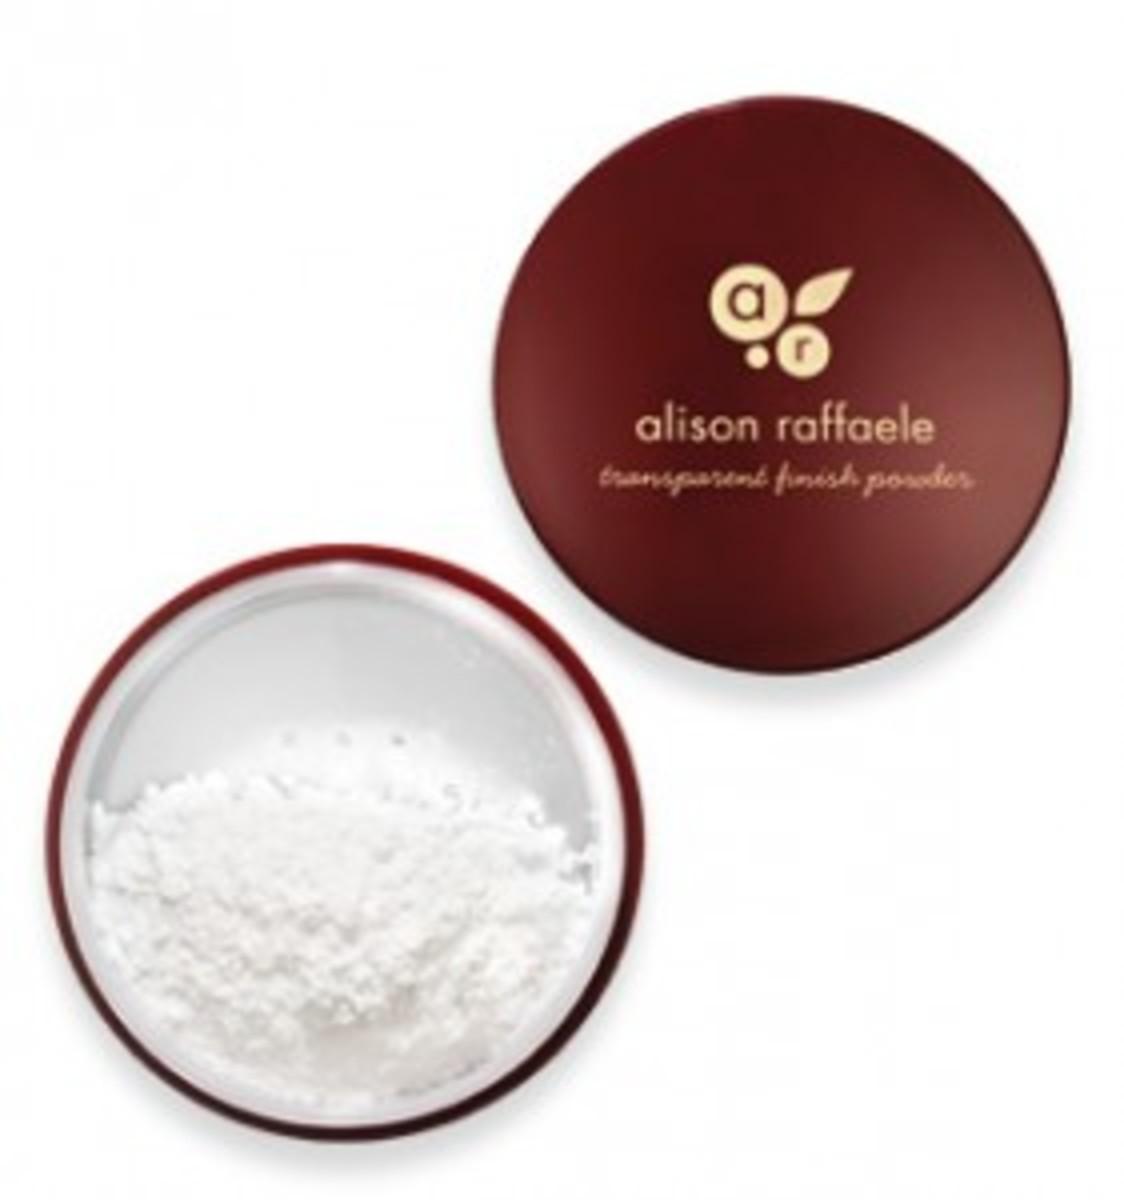 alison-raffaele-transparent-finish-powder-281x300